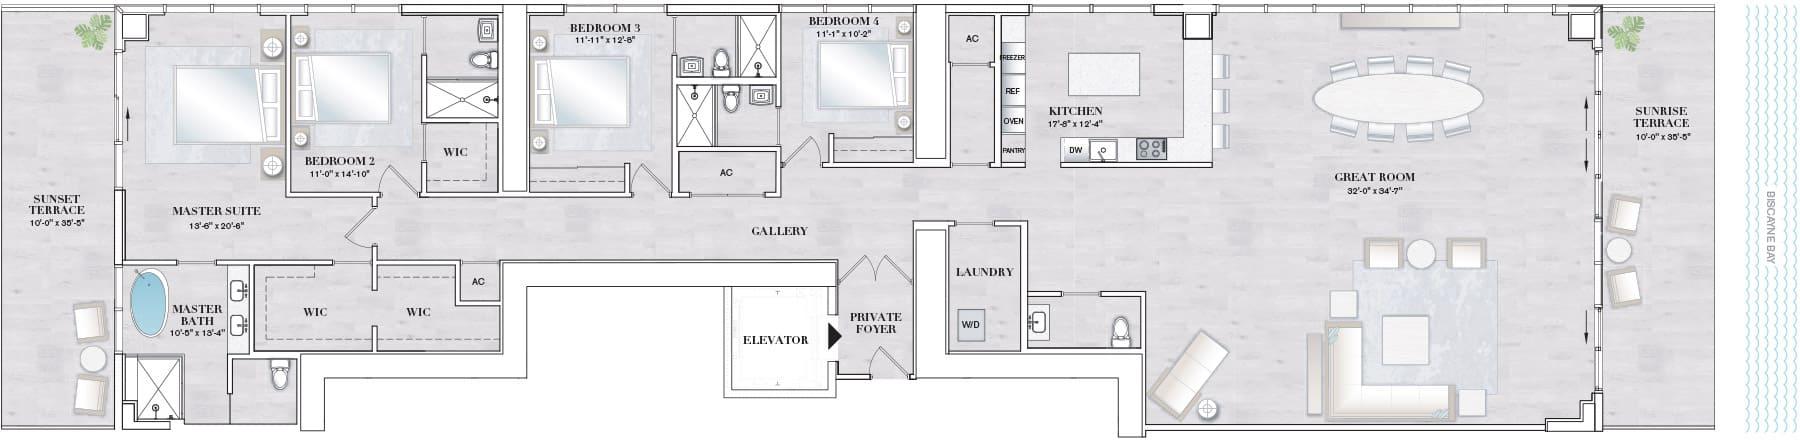 Elysee Edgewater Floor Plan E1